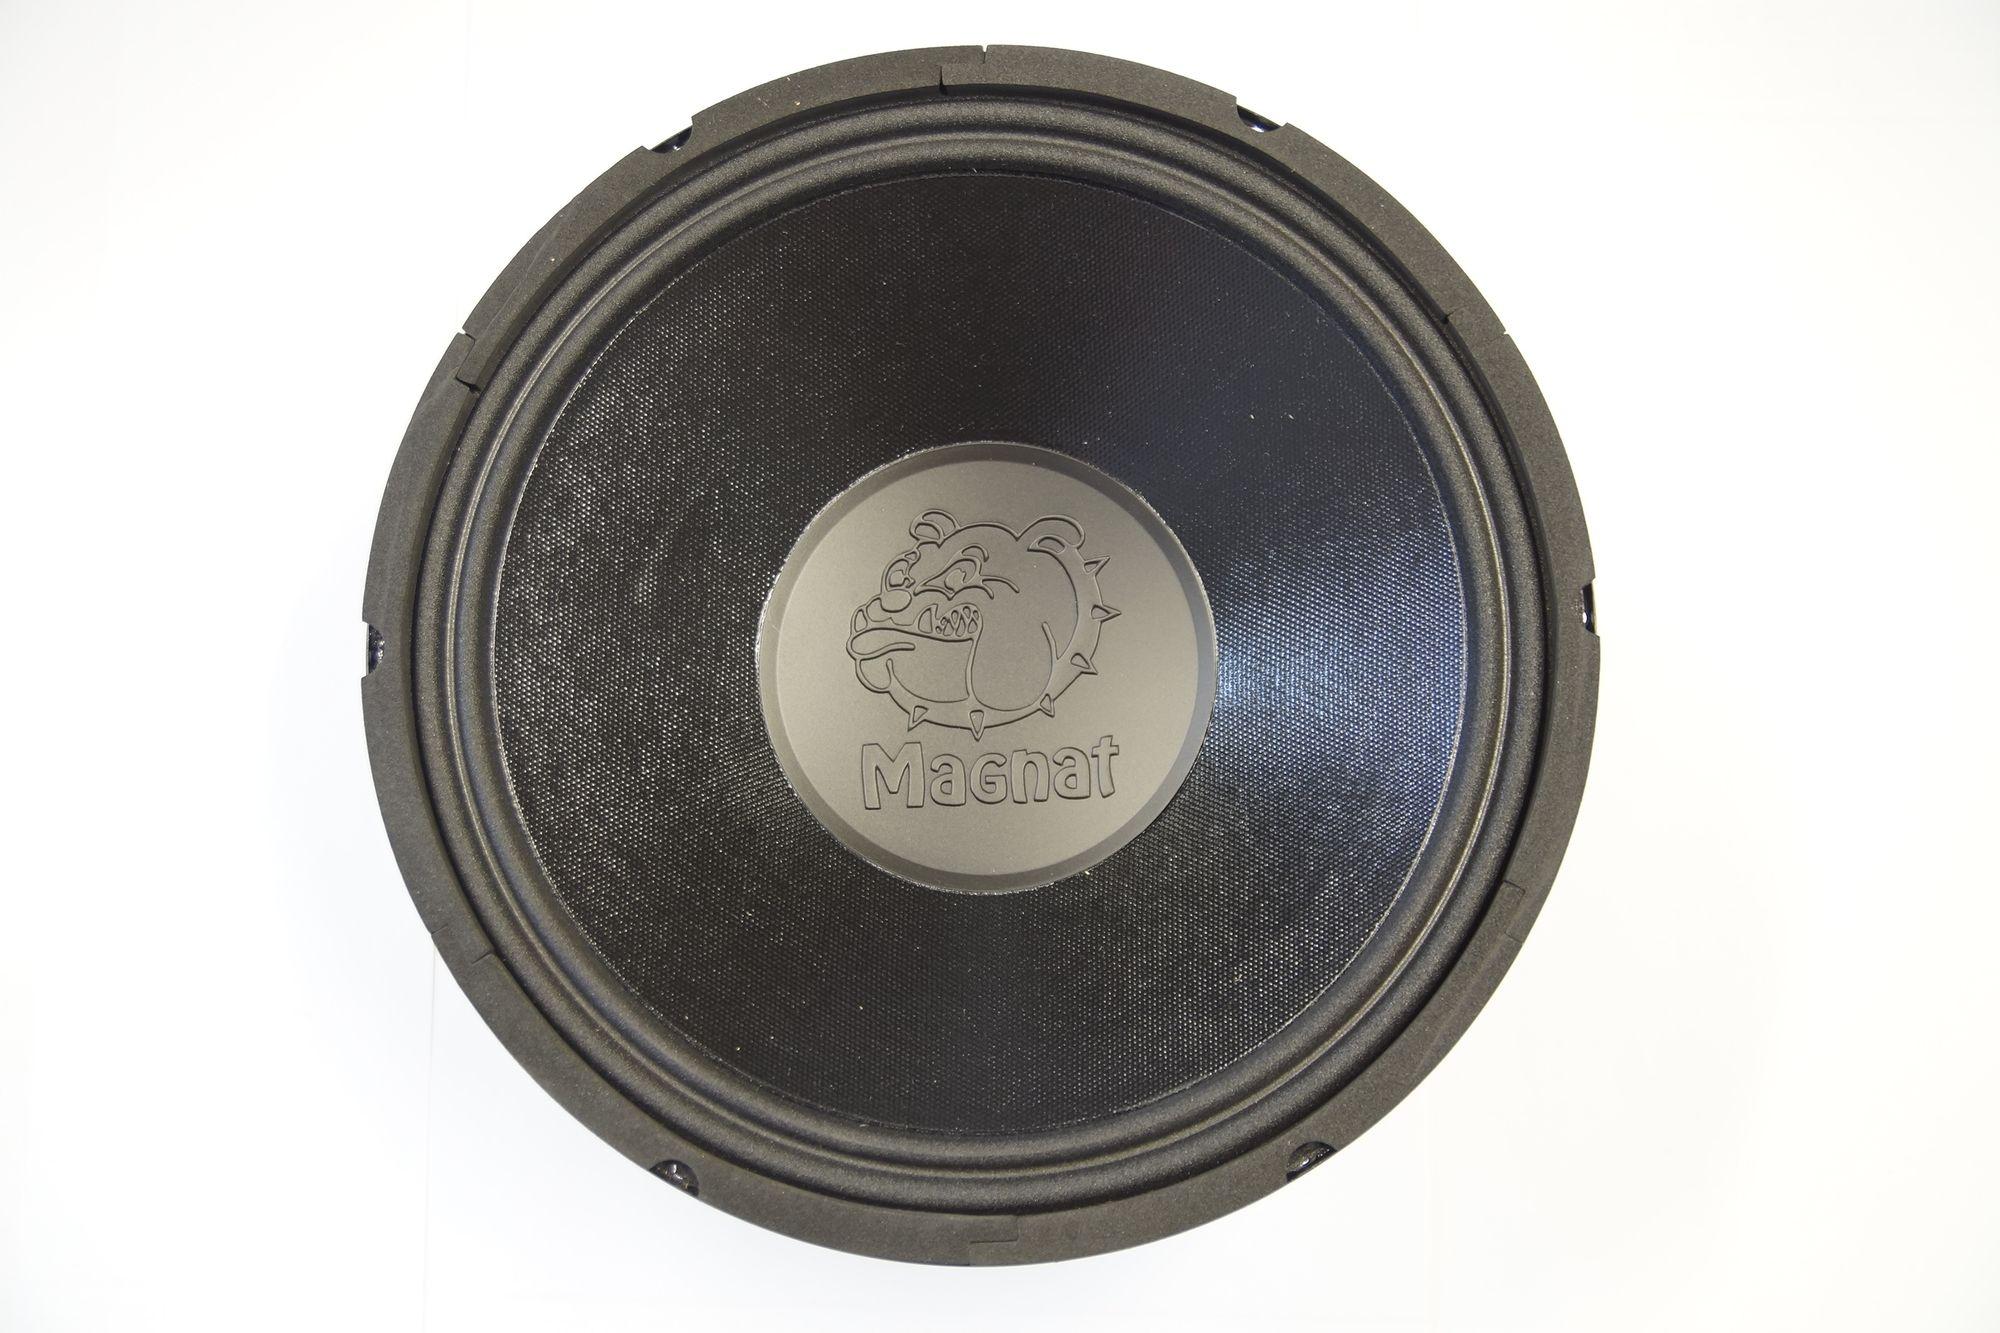 1 Stück 30 cm Subwoofer Magnat MWS 300CP4110 ISO Basslautsprecher Tieftöner  001